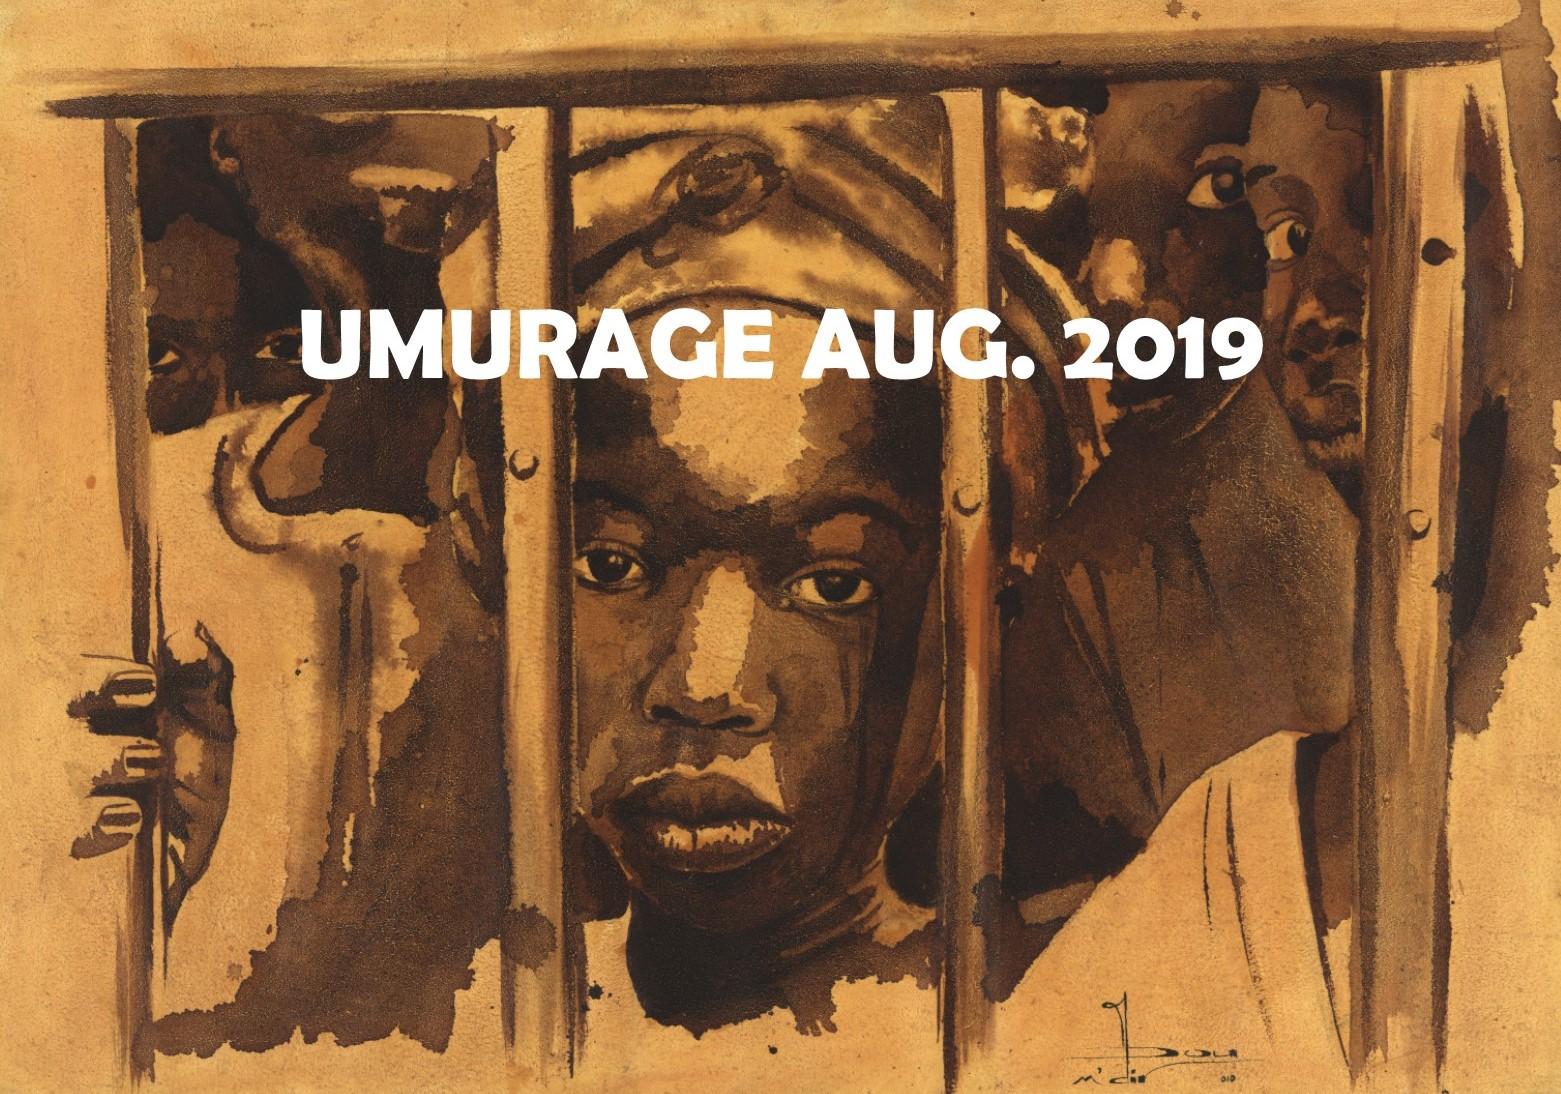 UMURAGE Aug 2019.jpg